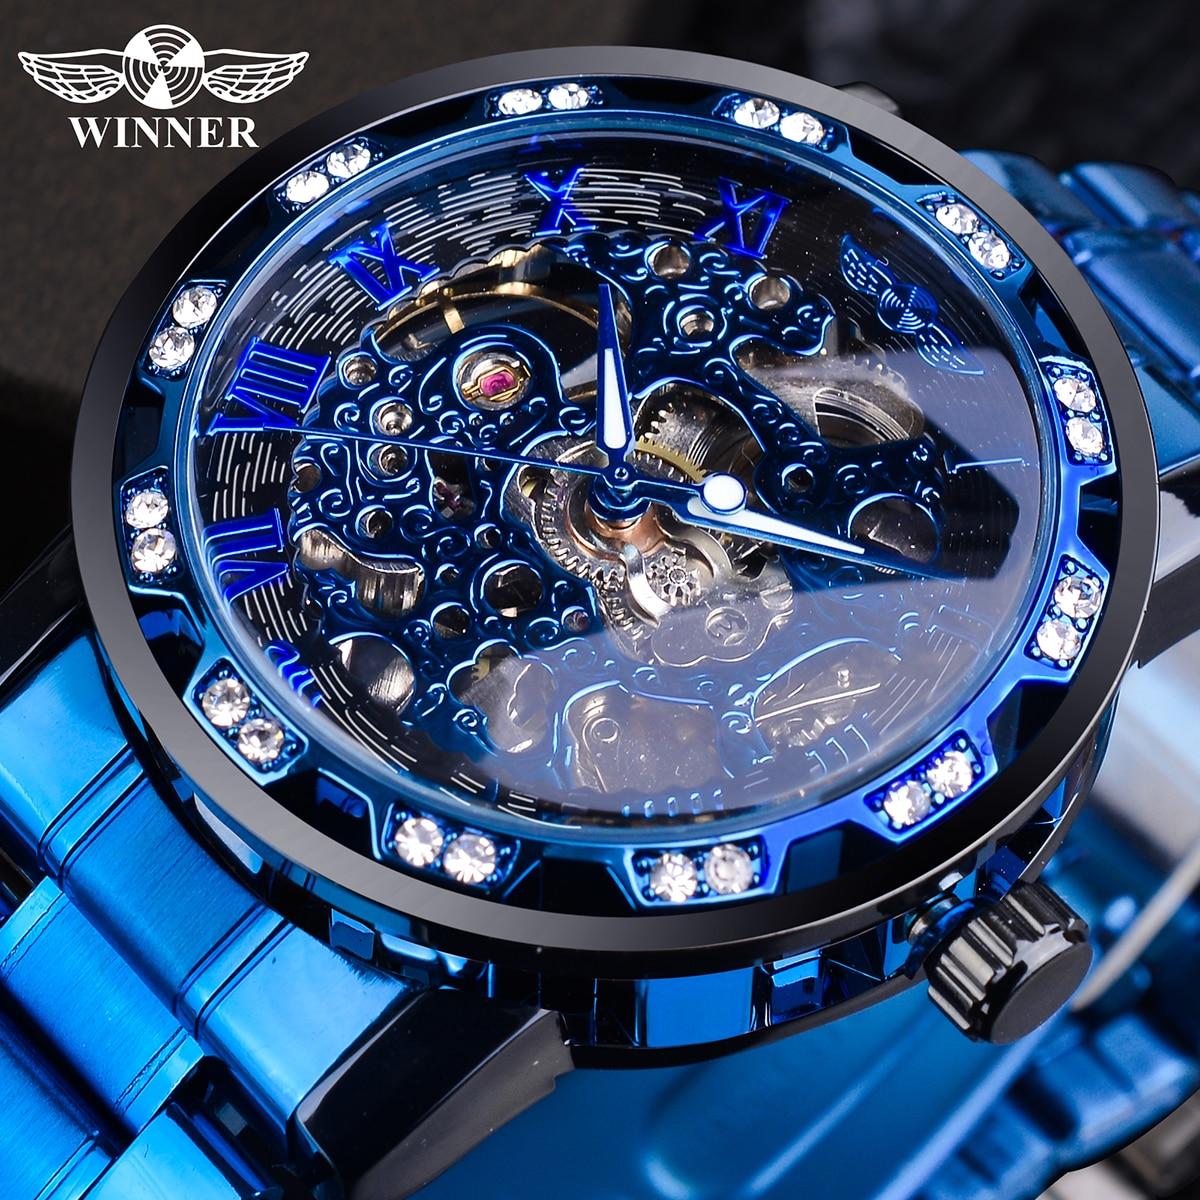 Winner Transparent Diamond Mechanical Watch Blue Stainless Steel Skeleton Watch Top Brand Luxury Bus